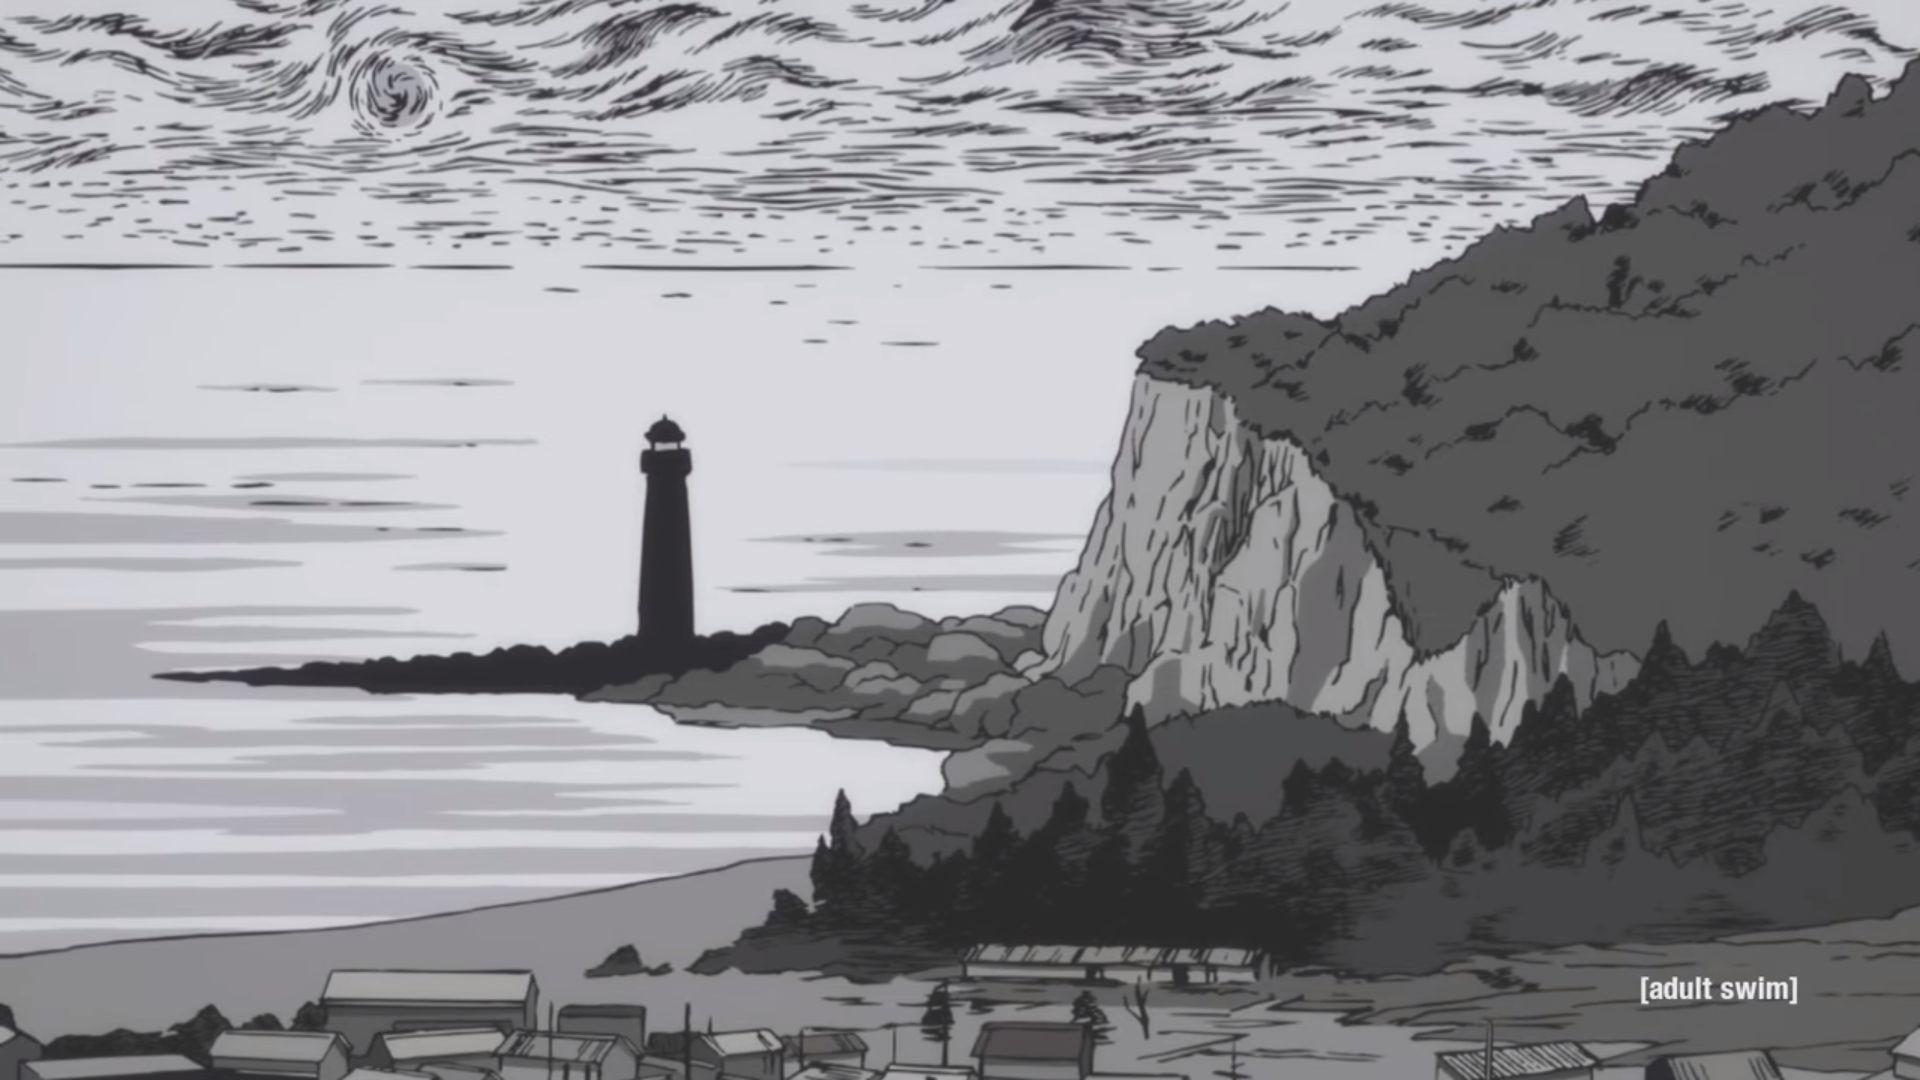 Adult Swim Releases Trailer For New Miniseries Uzumaki Geektyrant